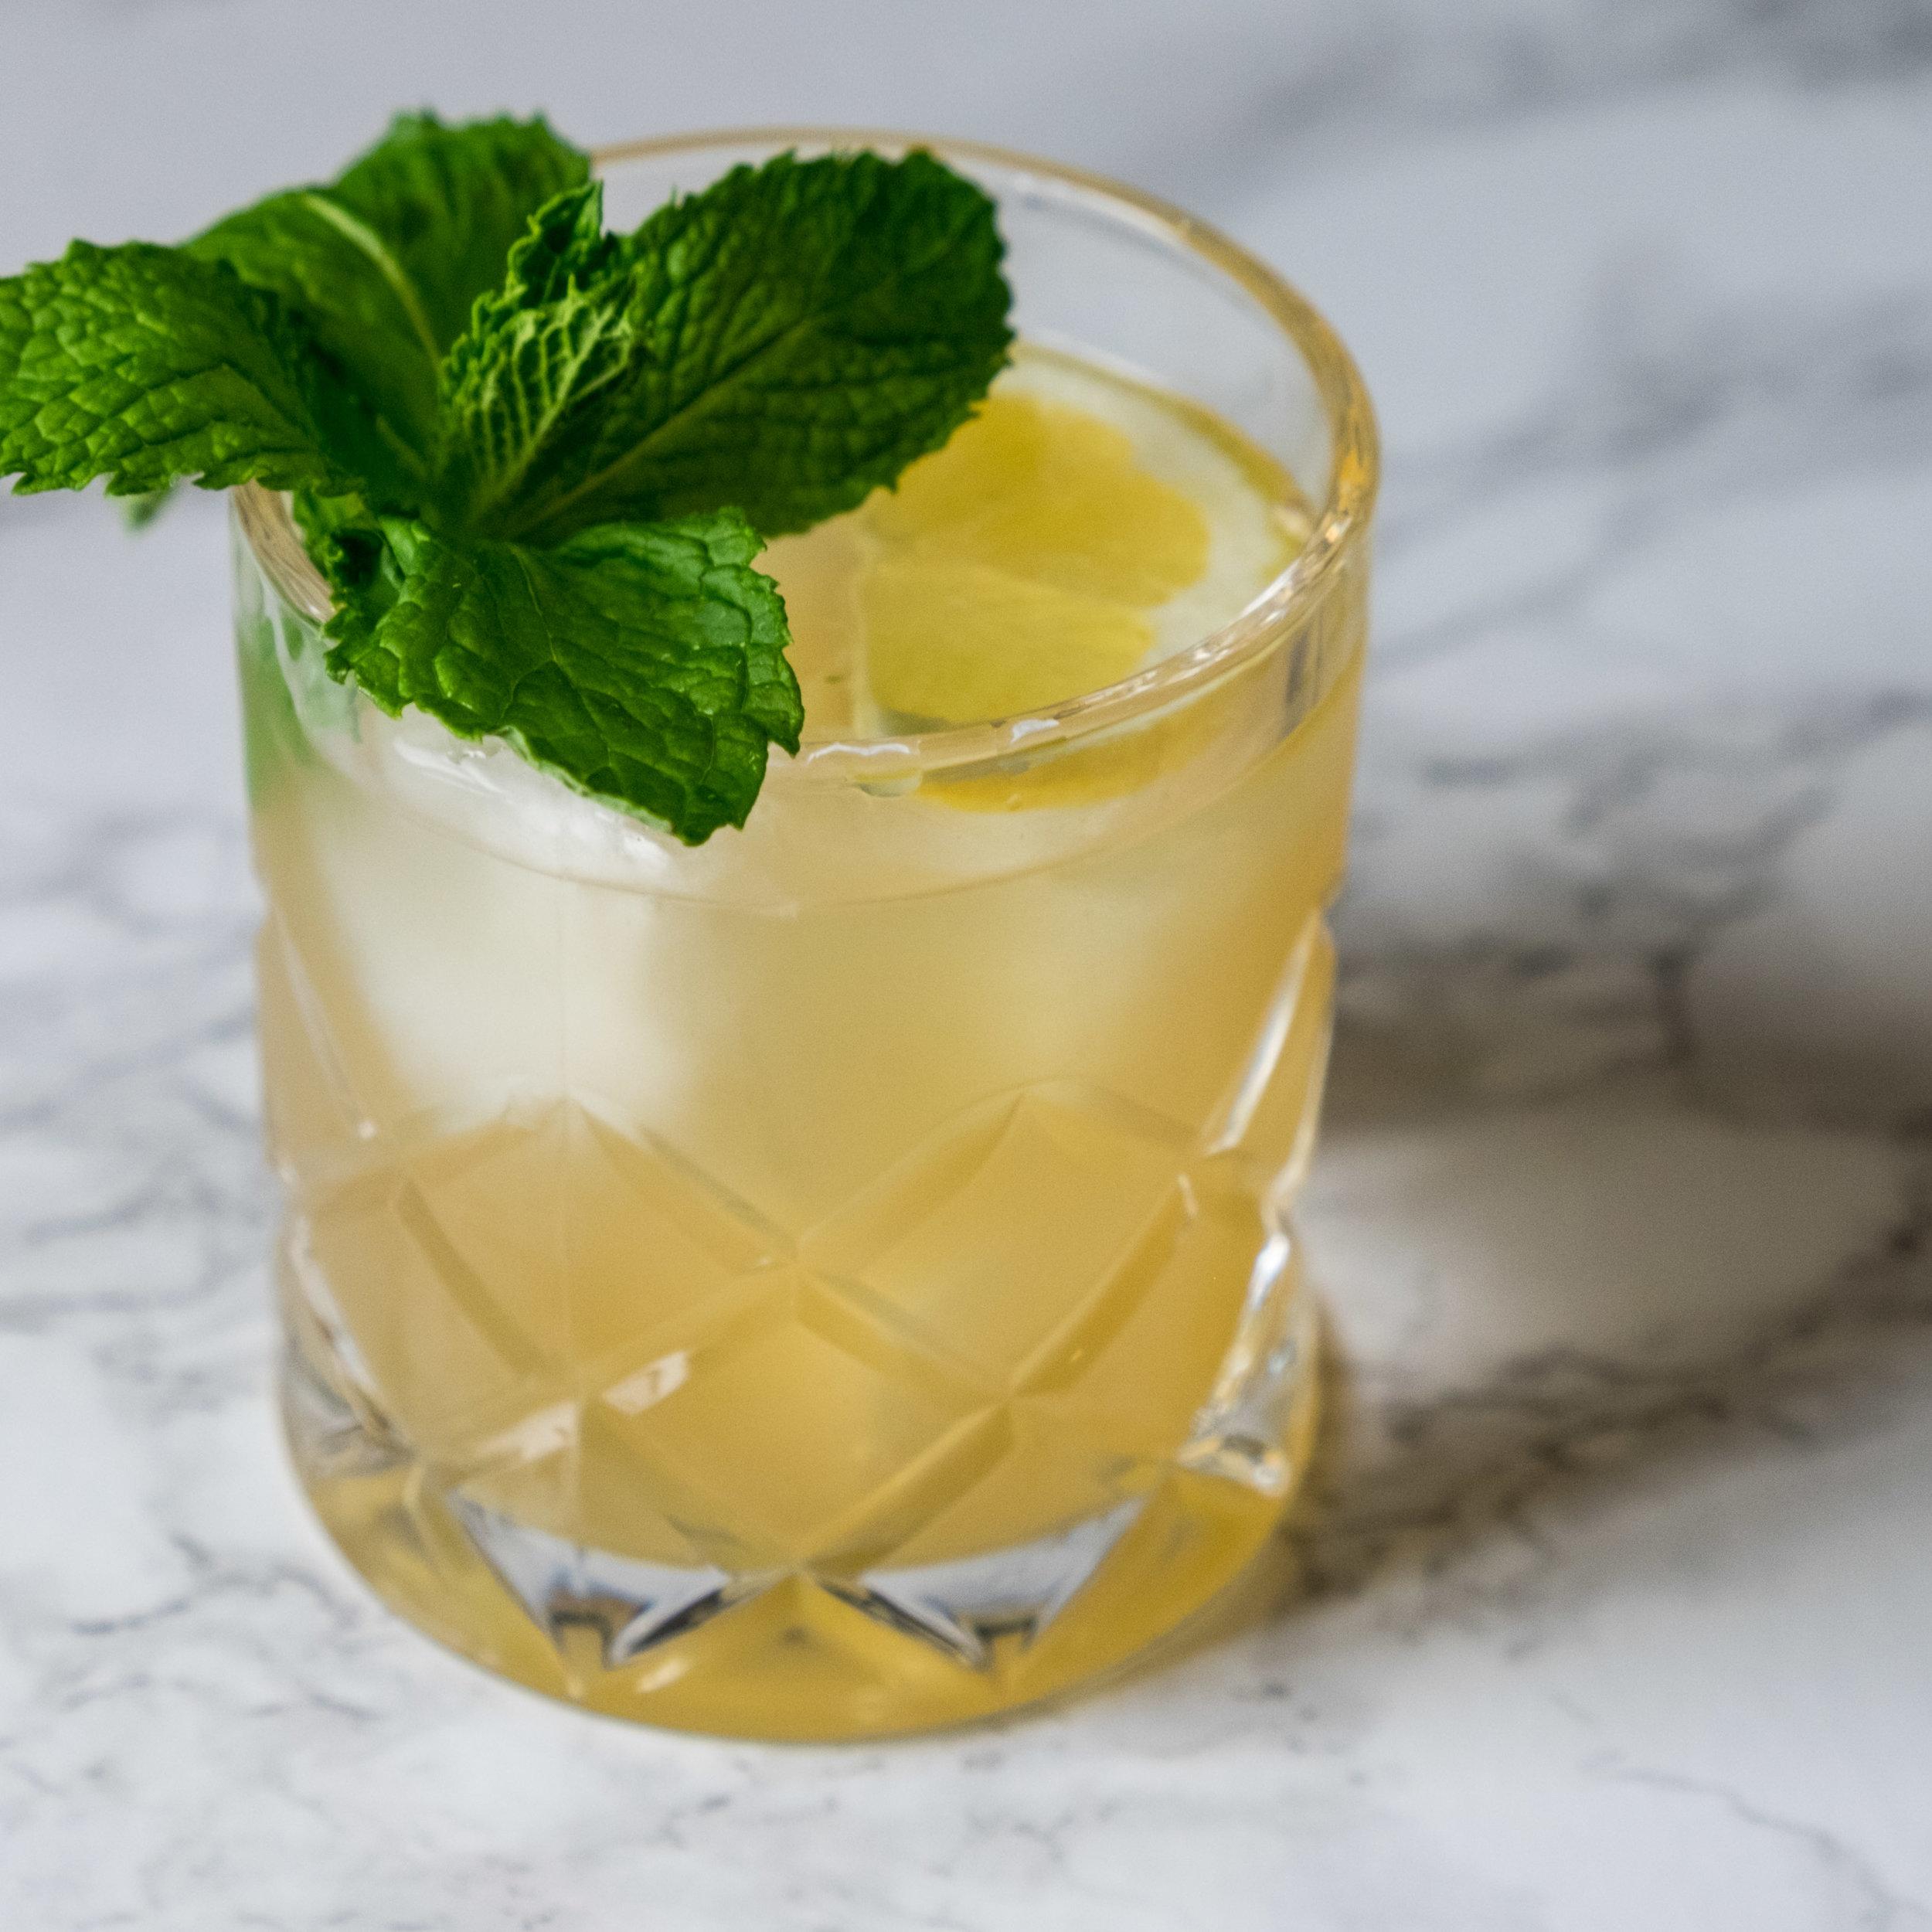 WHISKEY & GINGER SMASH - Whiskey and ginger make for a wonderful mix.